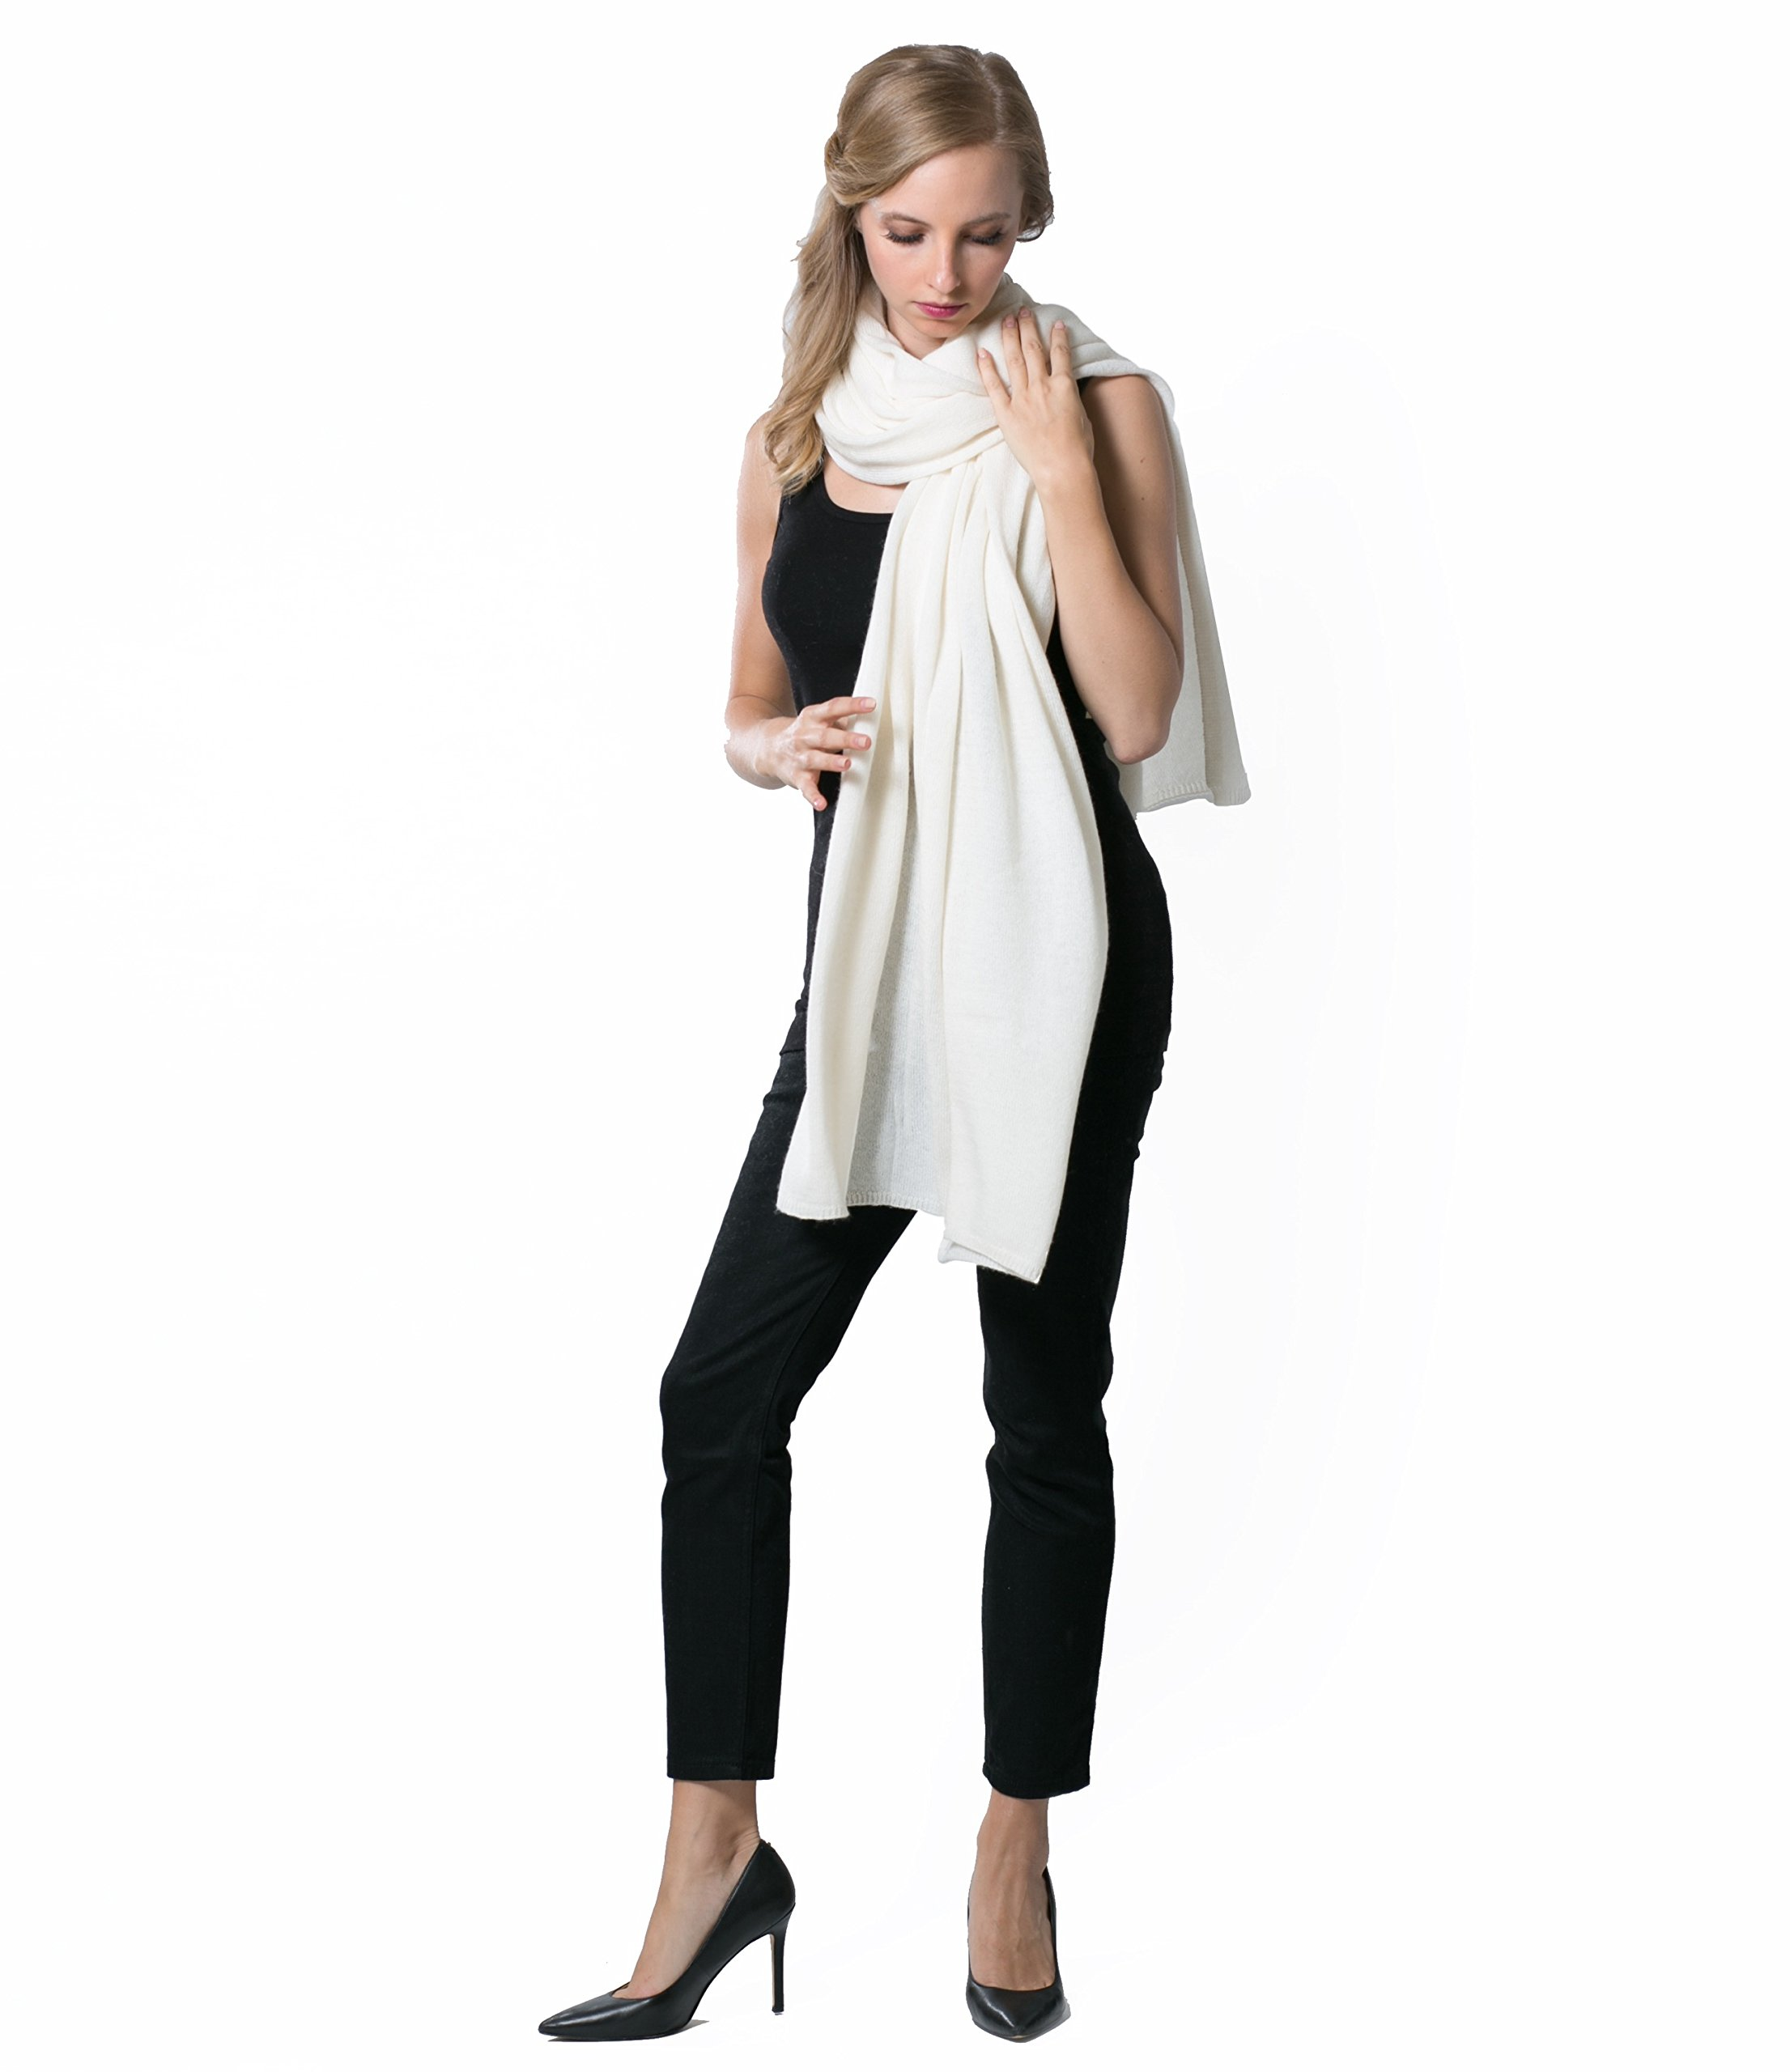 Super Soft Oversized 100% Cashmere Travel Blanket Scarf Wrap - Ivory White